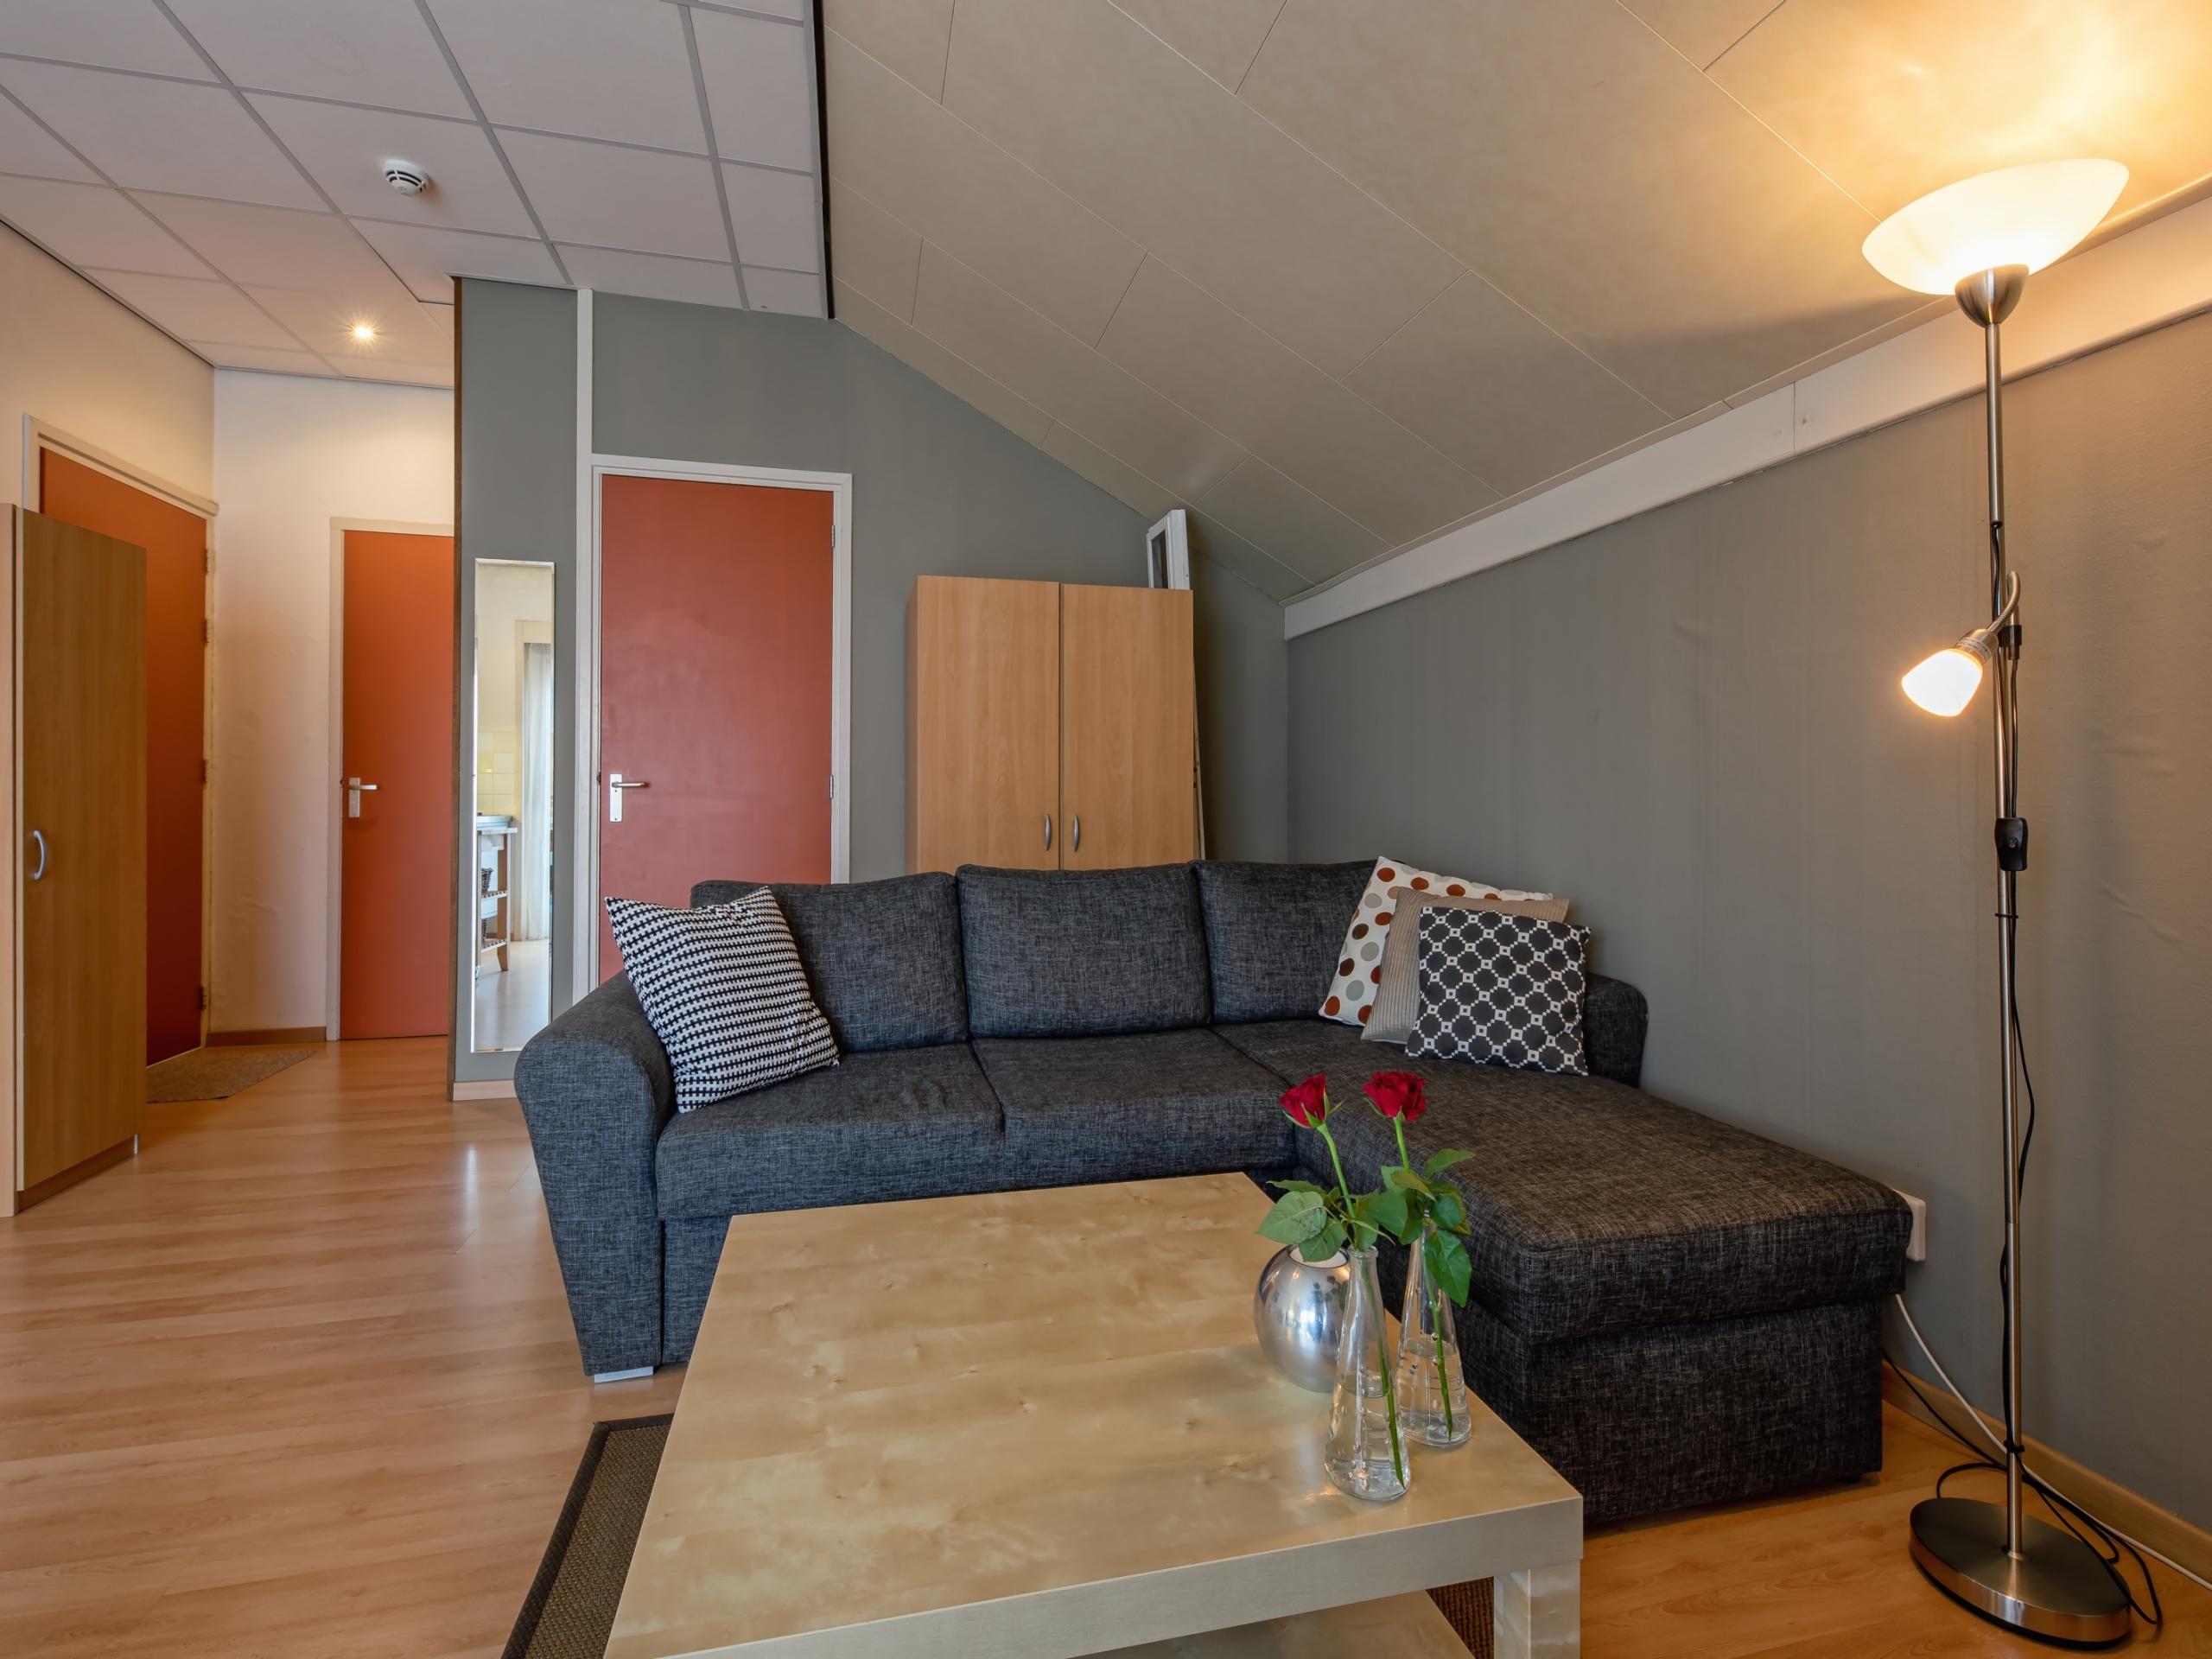 Komfortables Appartement in idealer Lage mitten in De Cocksdorp